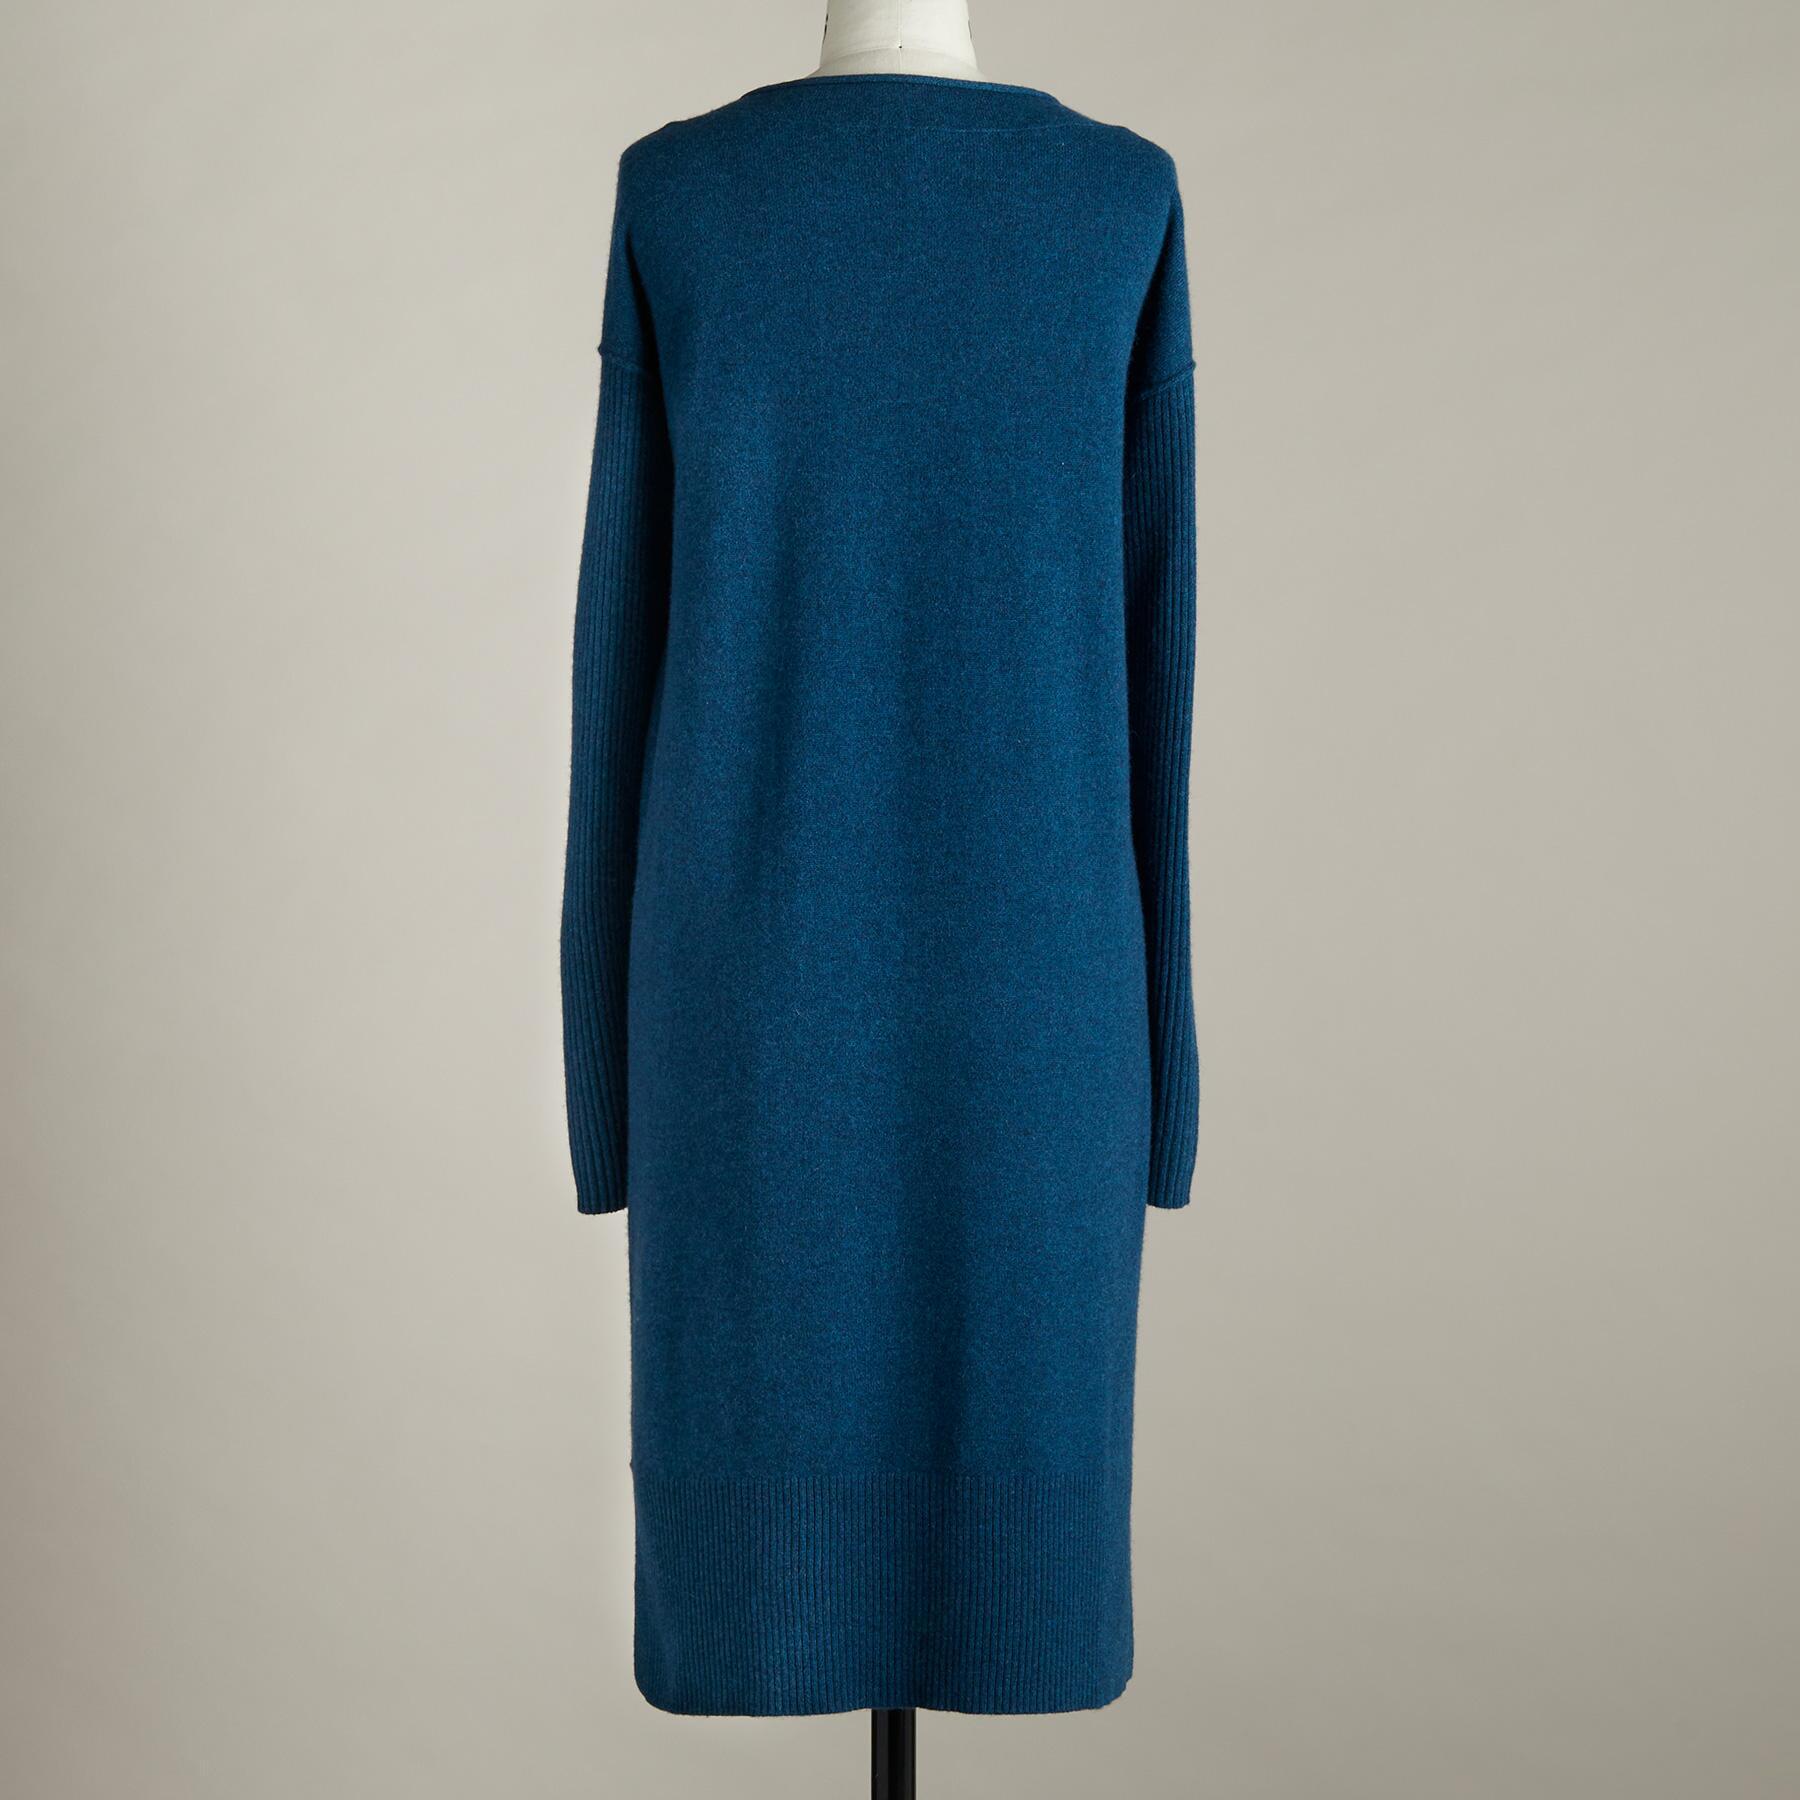 TILLIE CASHMERE DRESS: View 3